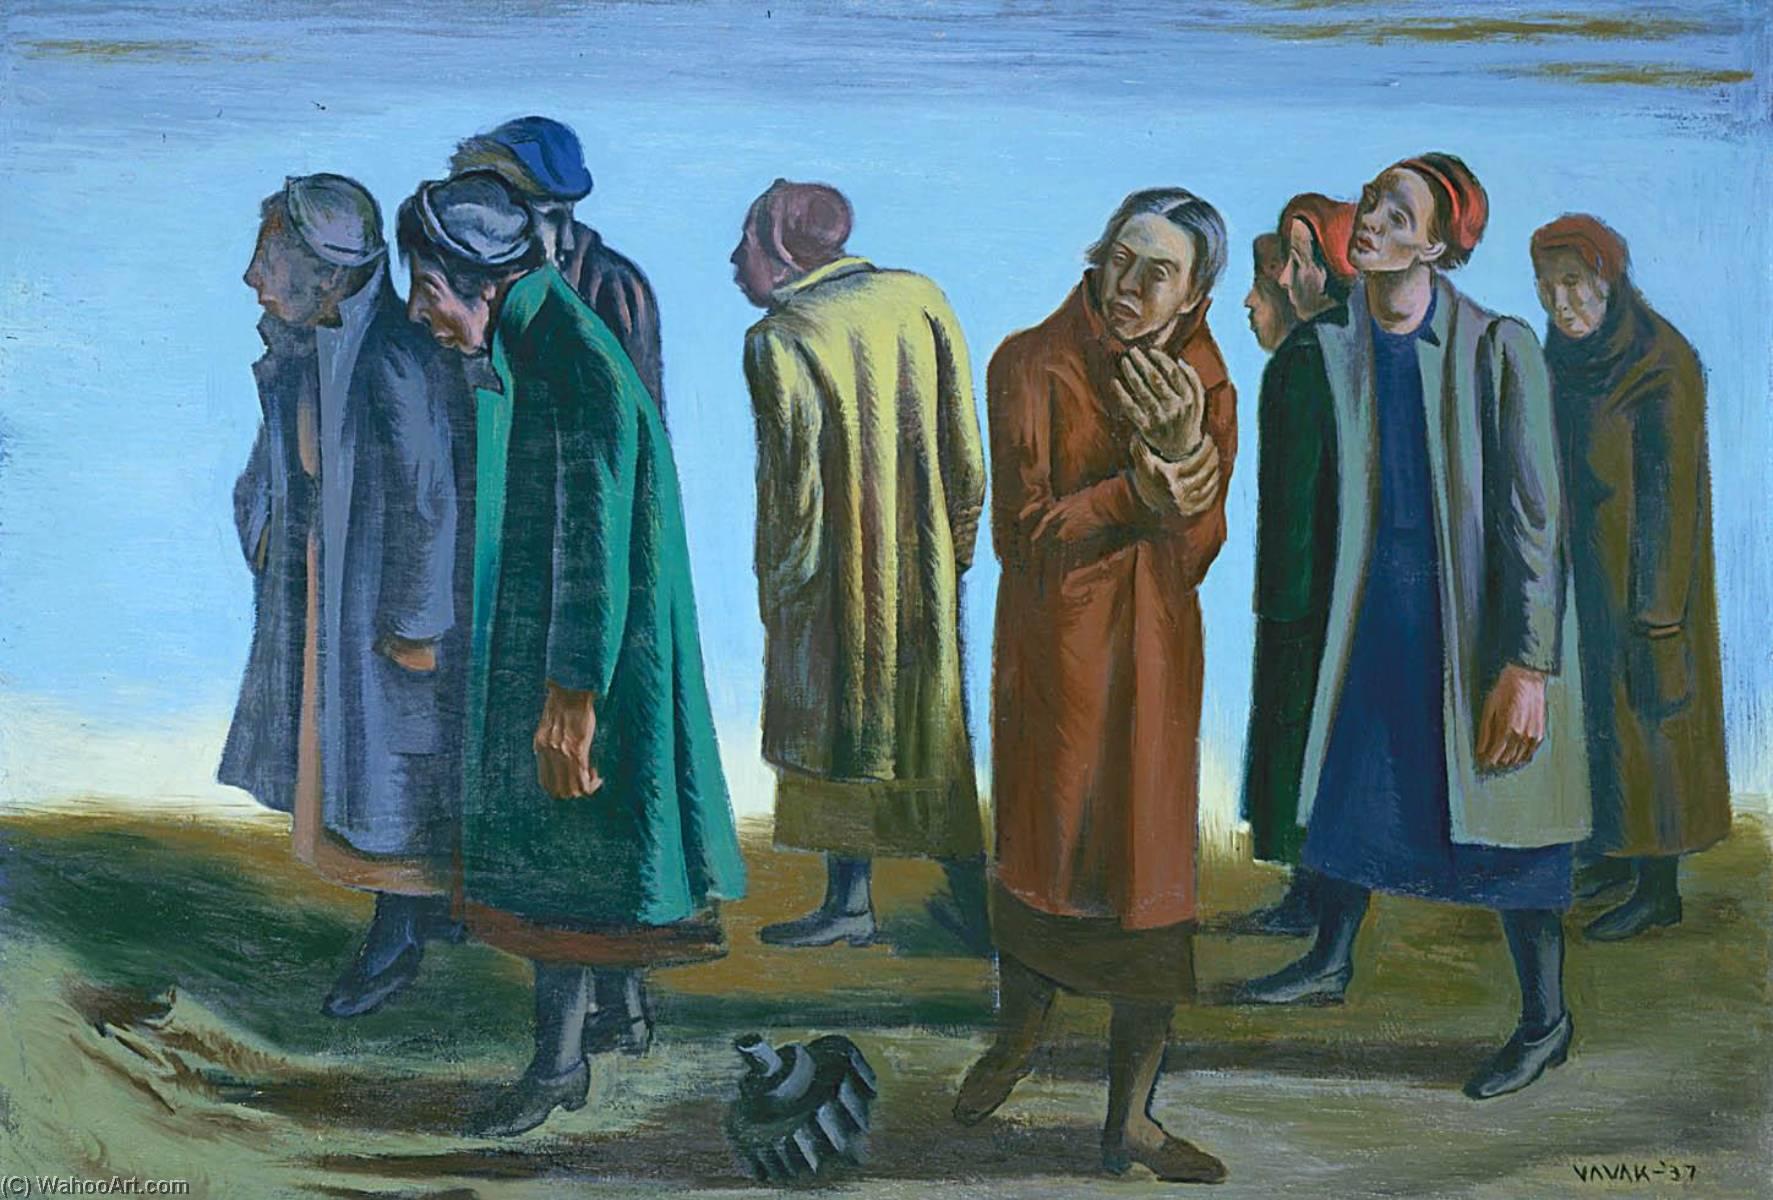 Wikioo.org - The Encyclopedia of Fine Arts - Painting, Artwork by Joseph Vavak - Women of Flint